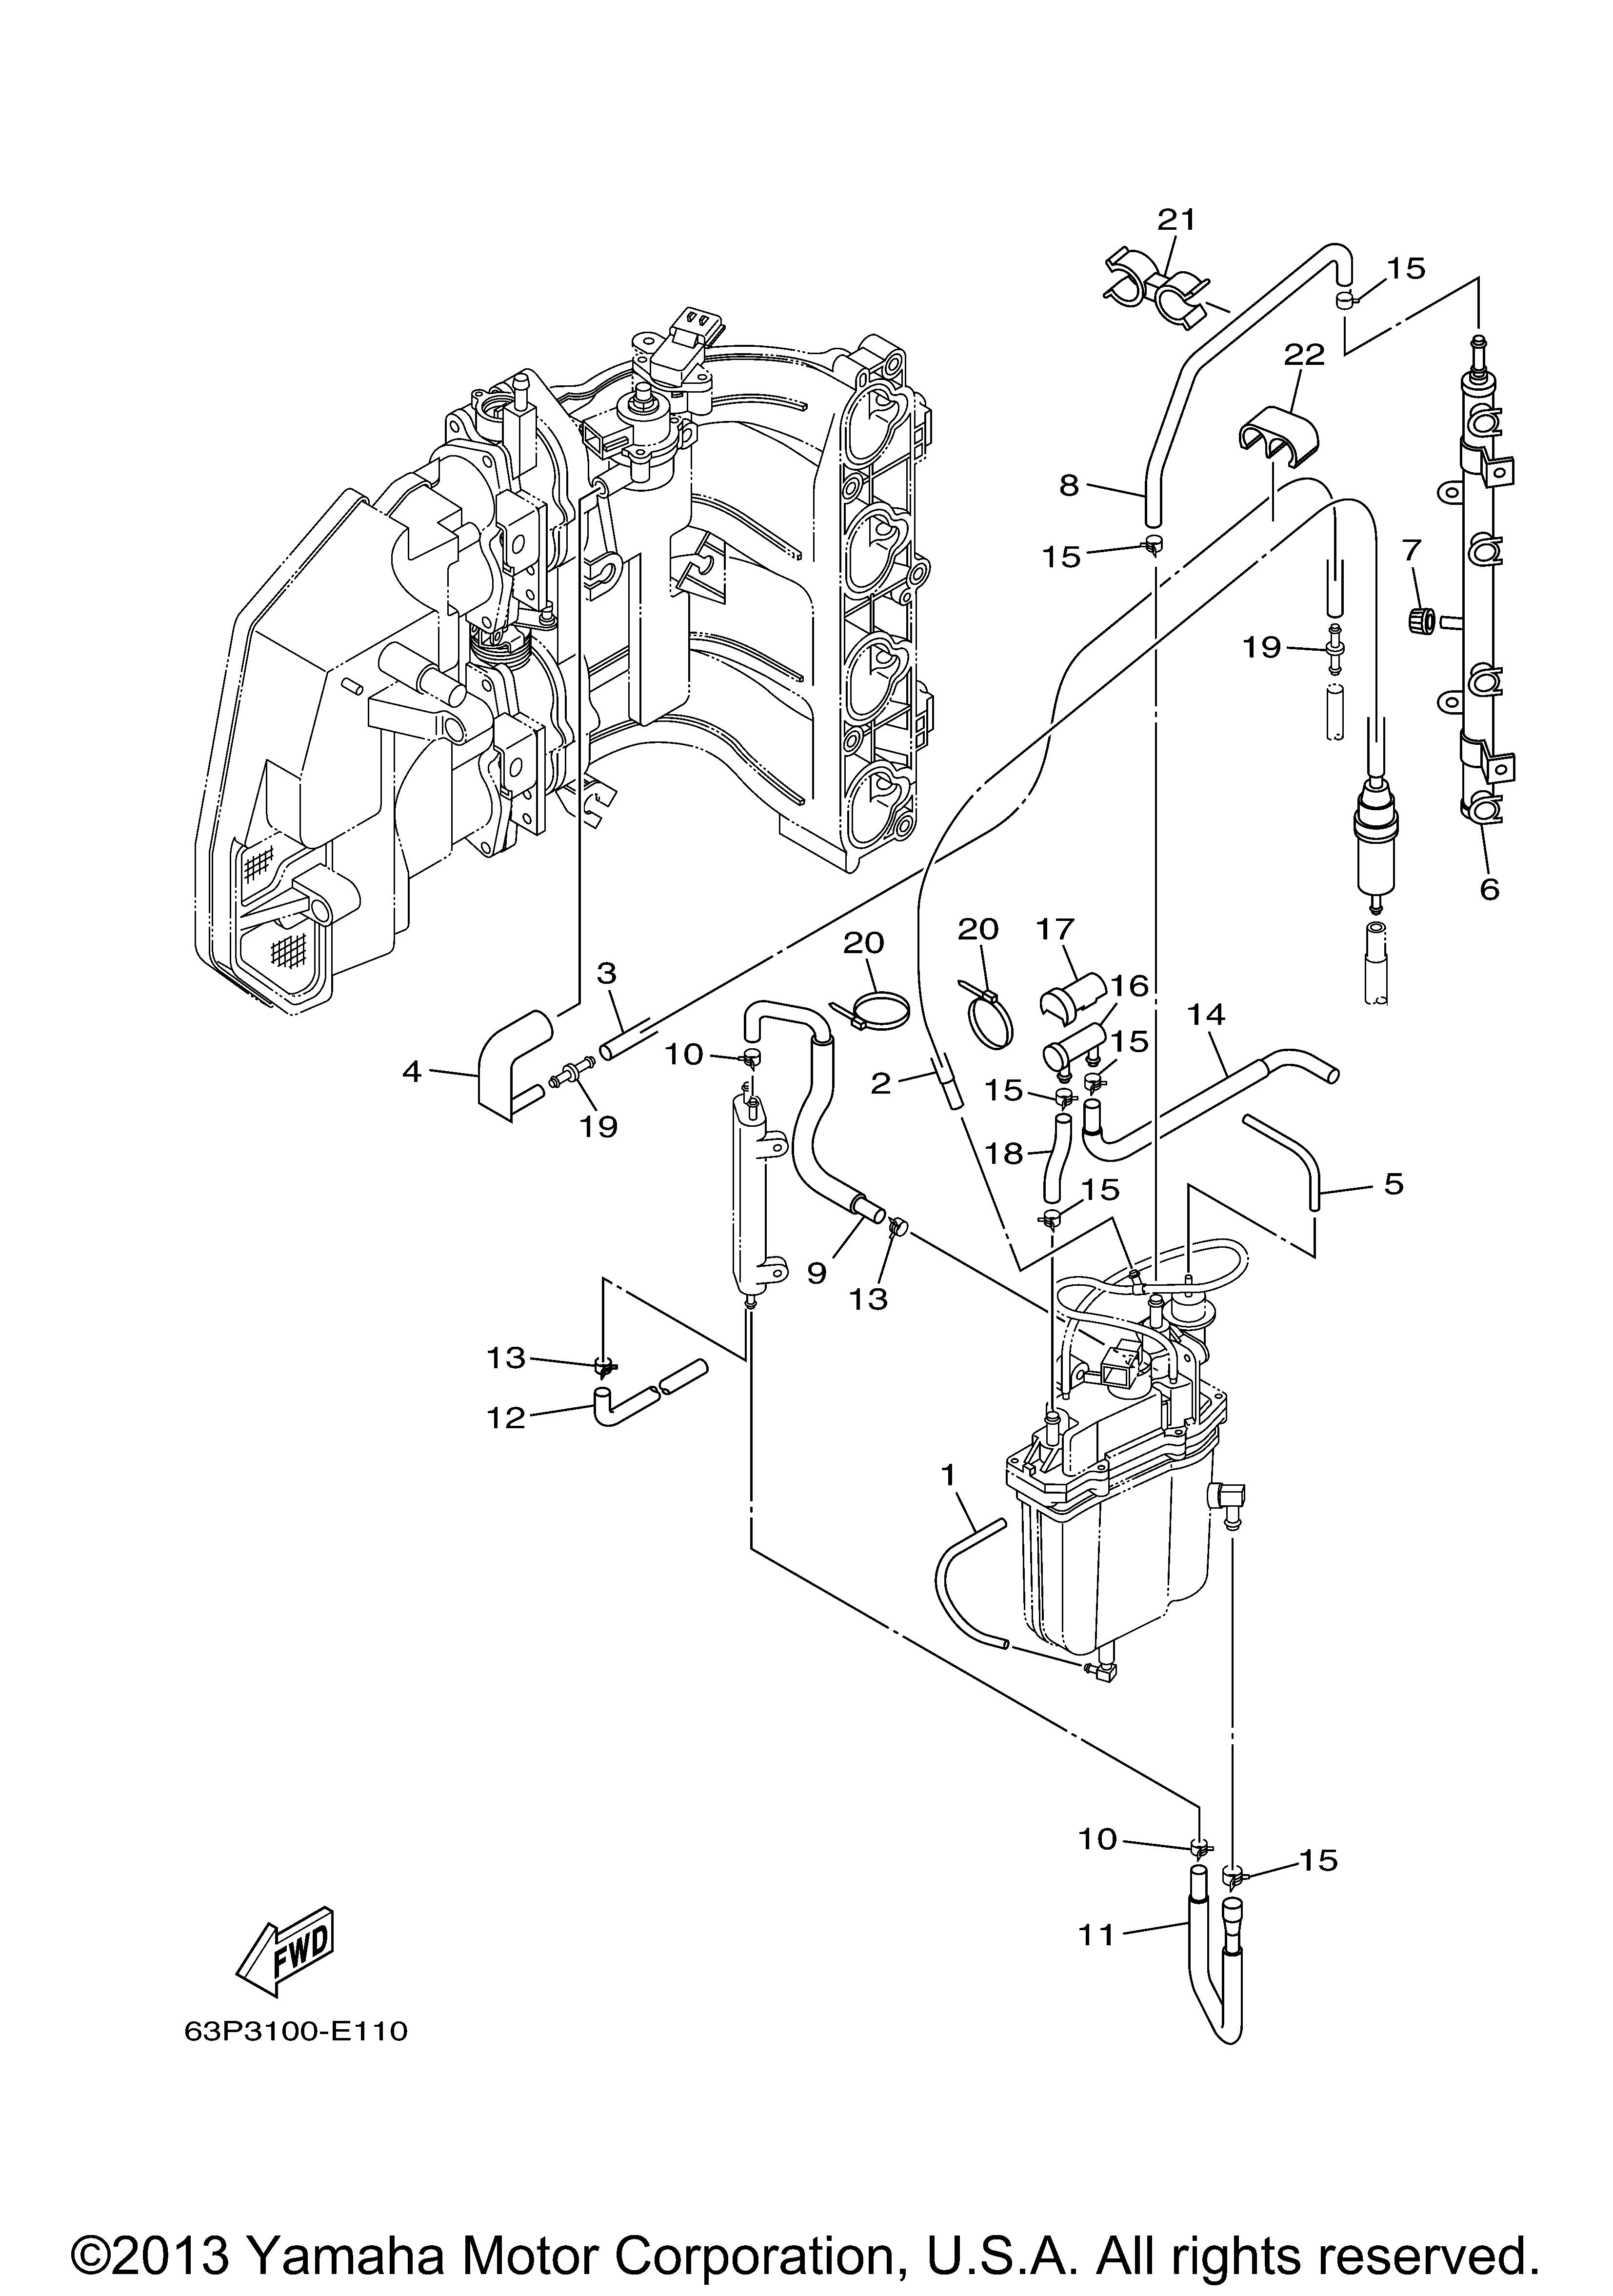 honda qa50 wiring diagram honda online parts diagram read online wiring diagram  honda online parts diagram read